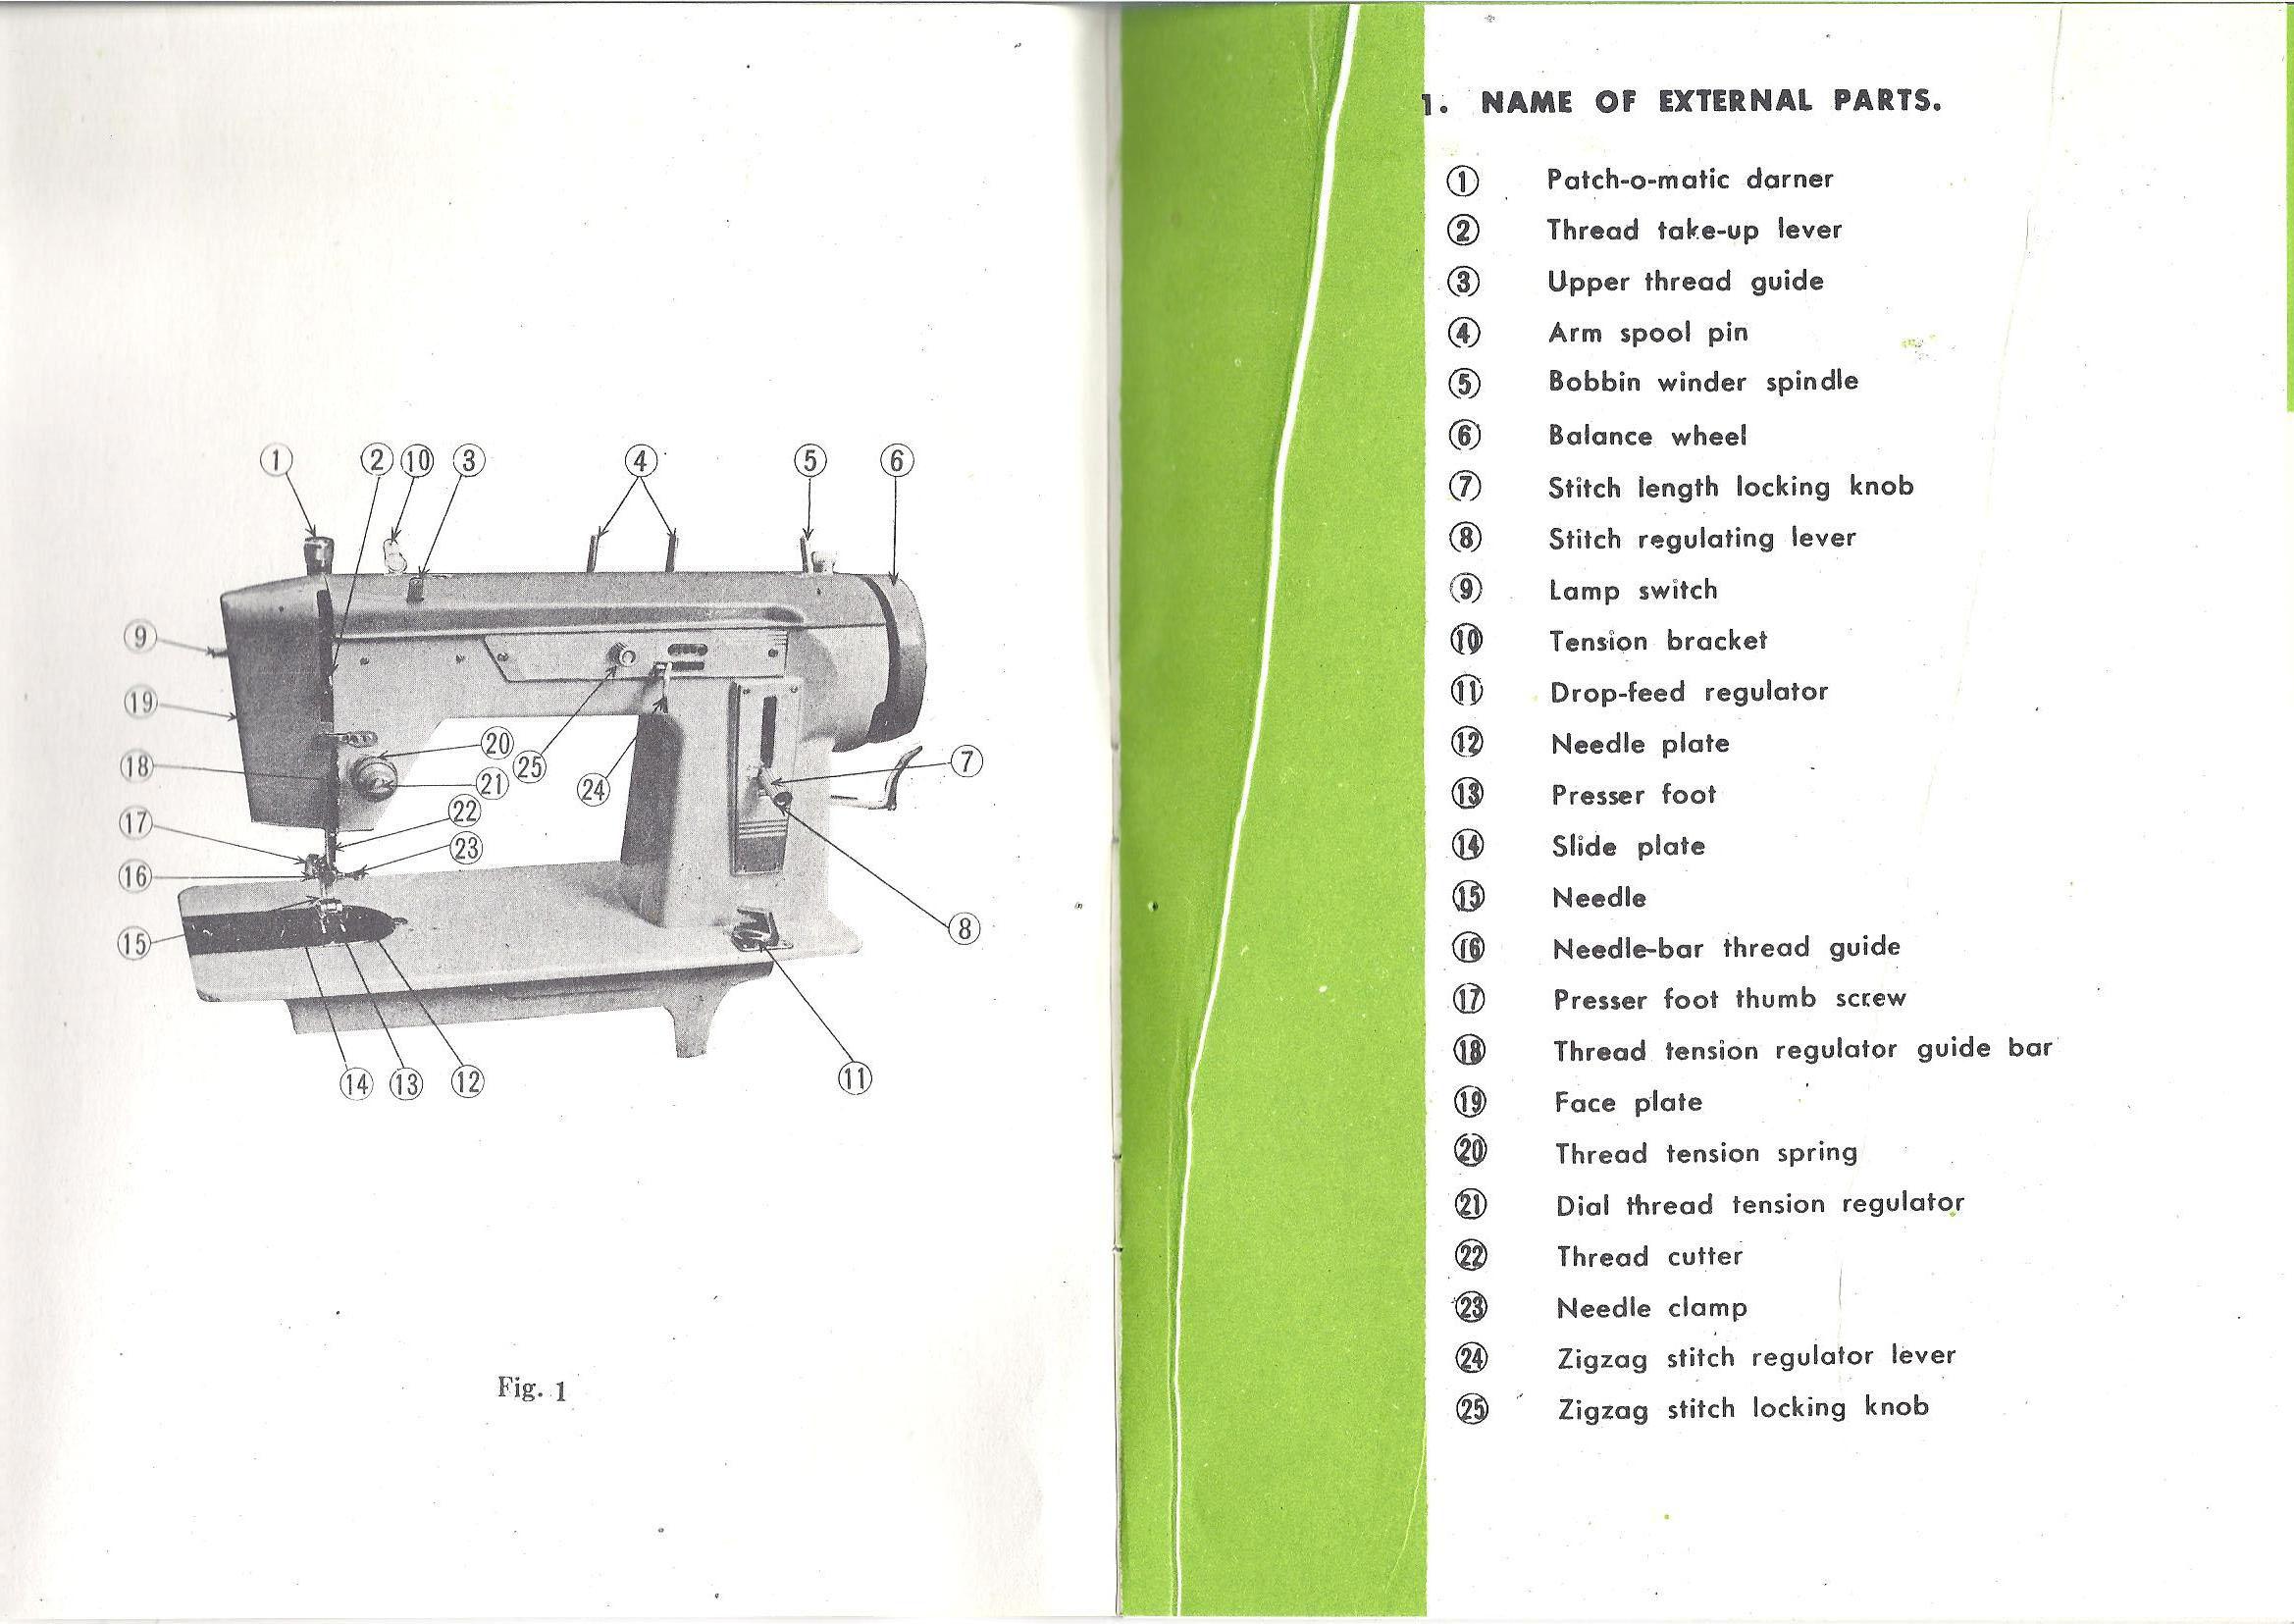 elna sewing machine parts diagram hyundai santa fe name bing